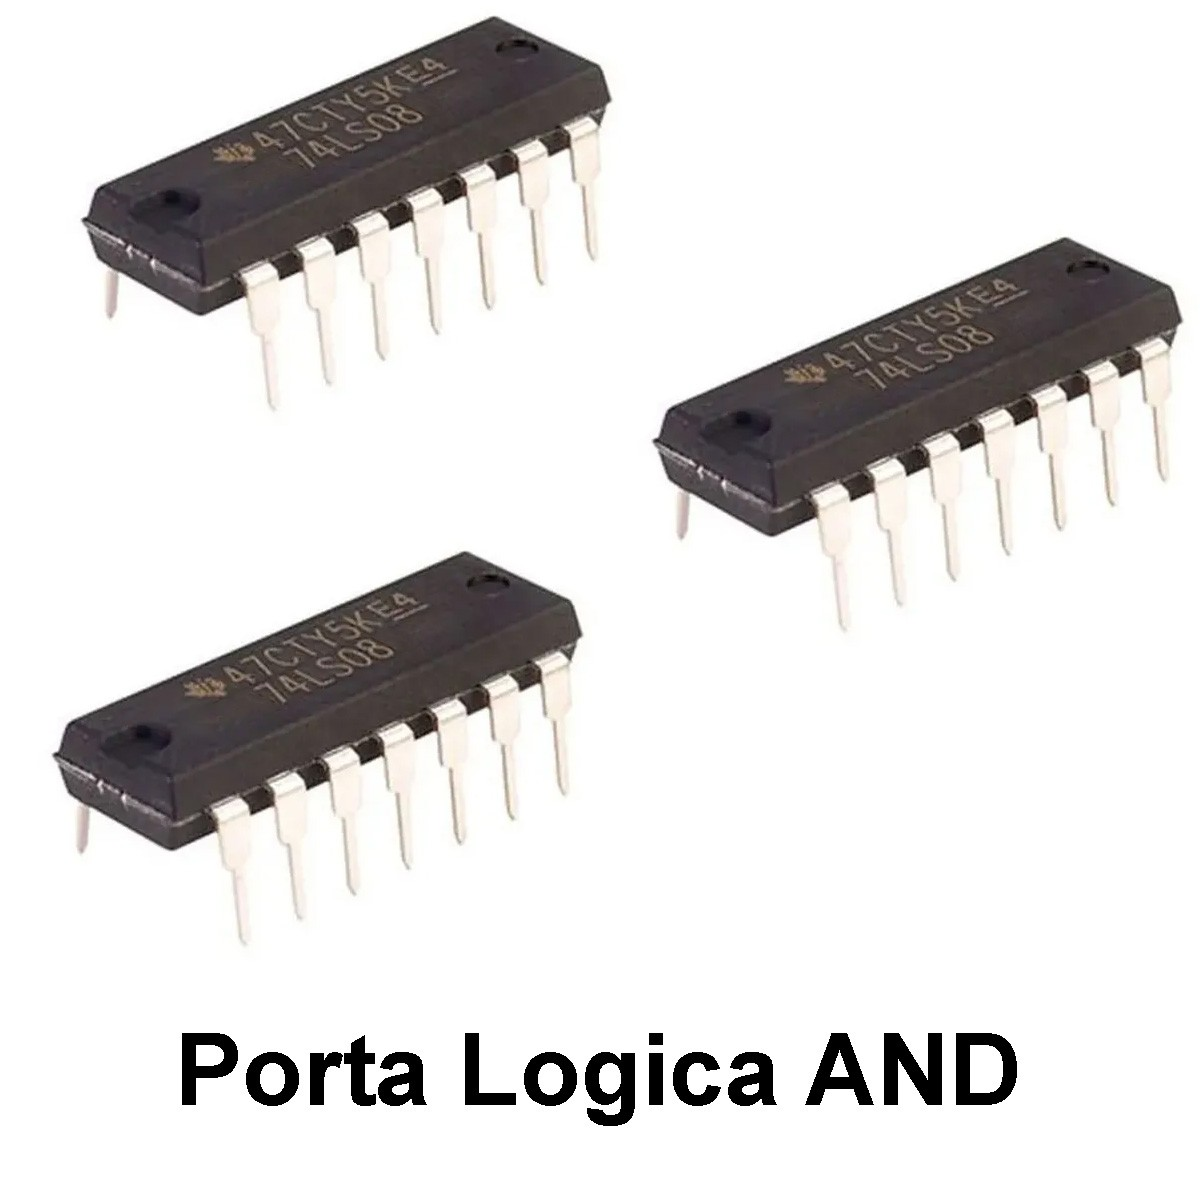 3x Porta Lógica AND Circuito Integrado - CI 74LS08